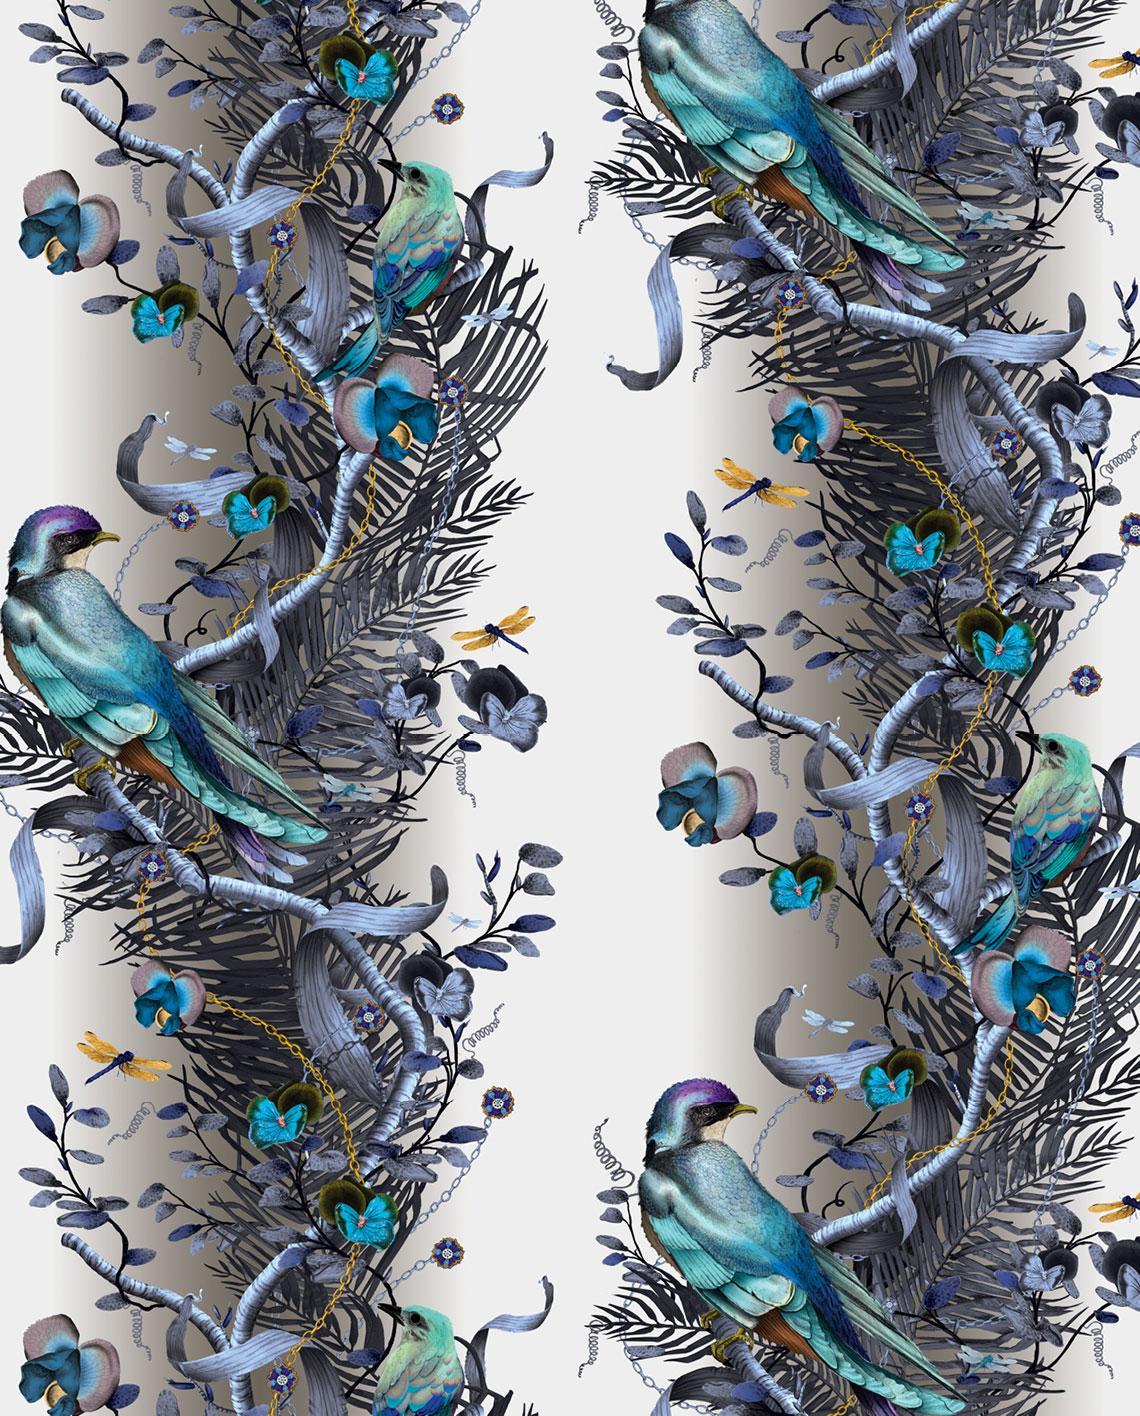 13._Birds_in_Chains_Wallpaper